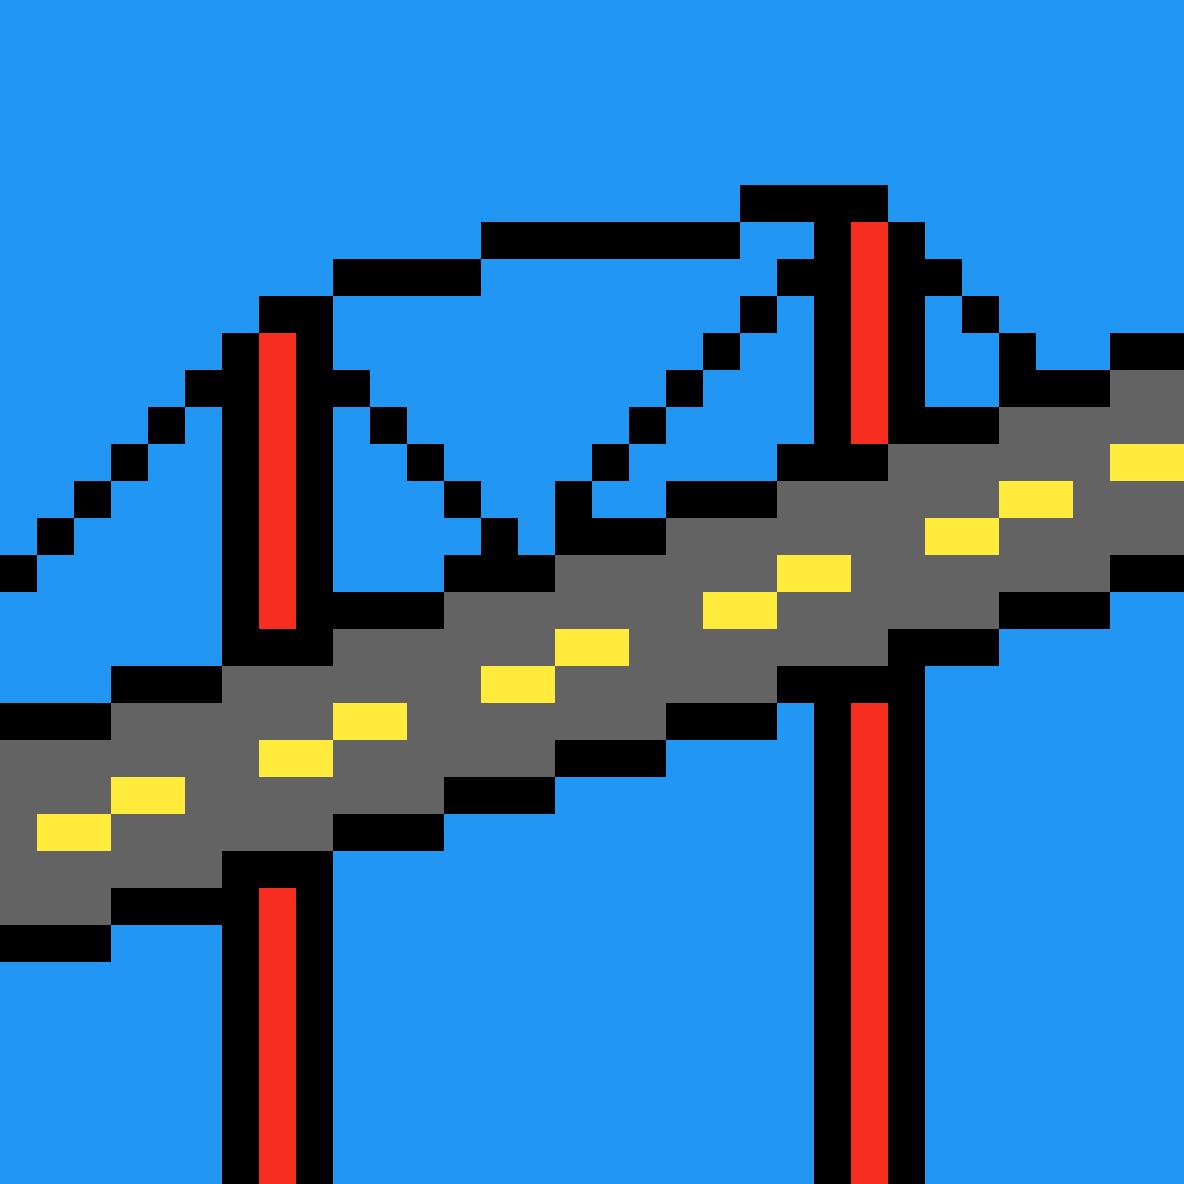 Bridge by KillerScythe